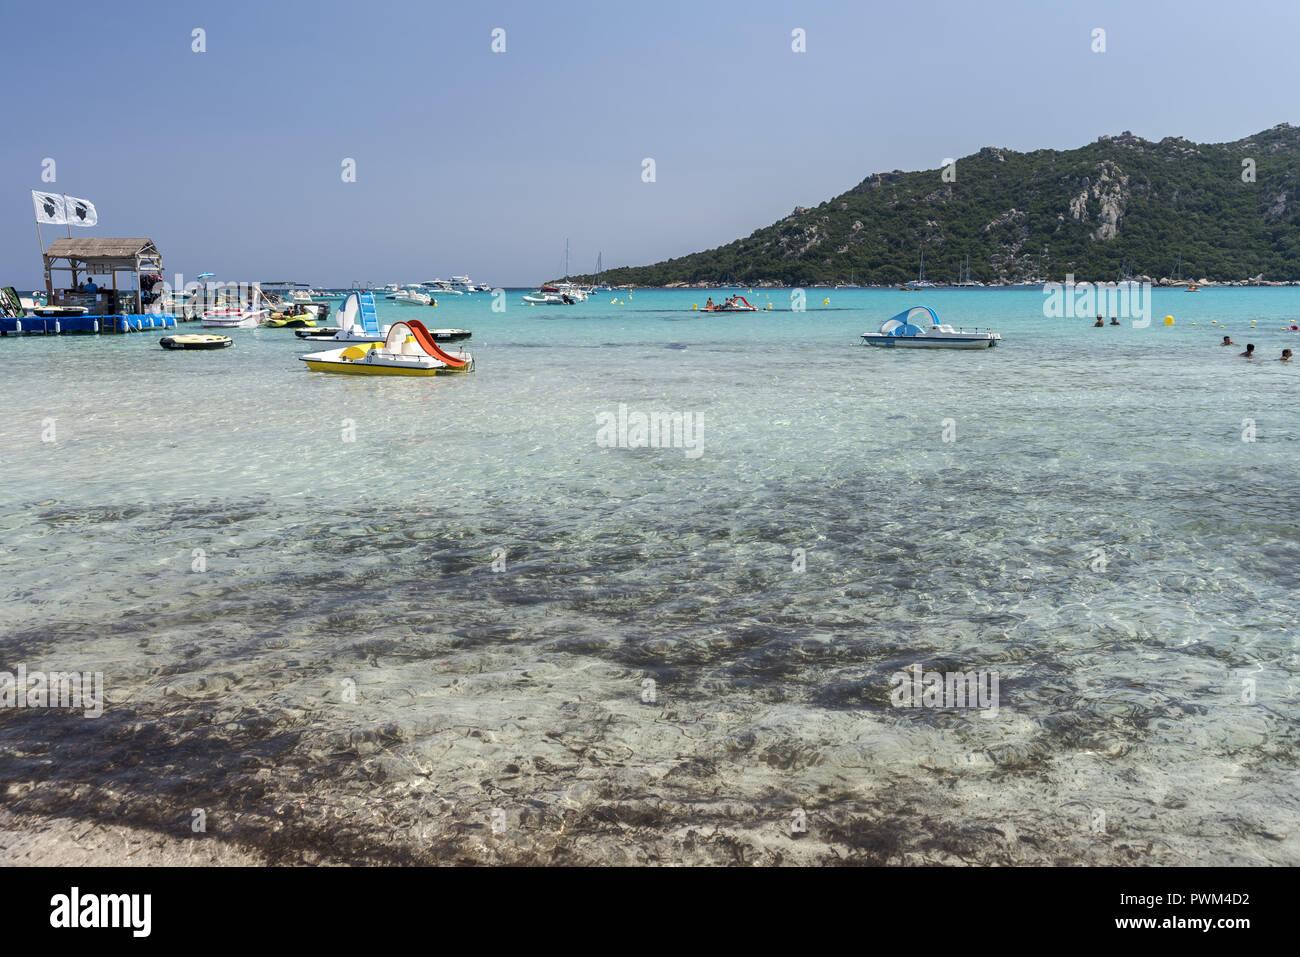 Tourist recreational water vehicles in the bay of Santa Giulia. Beach of Santa Giulia in Corsica. Plaża Santa Giulia na Korsyce. - Stock Image